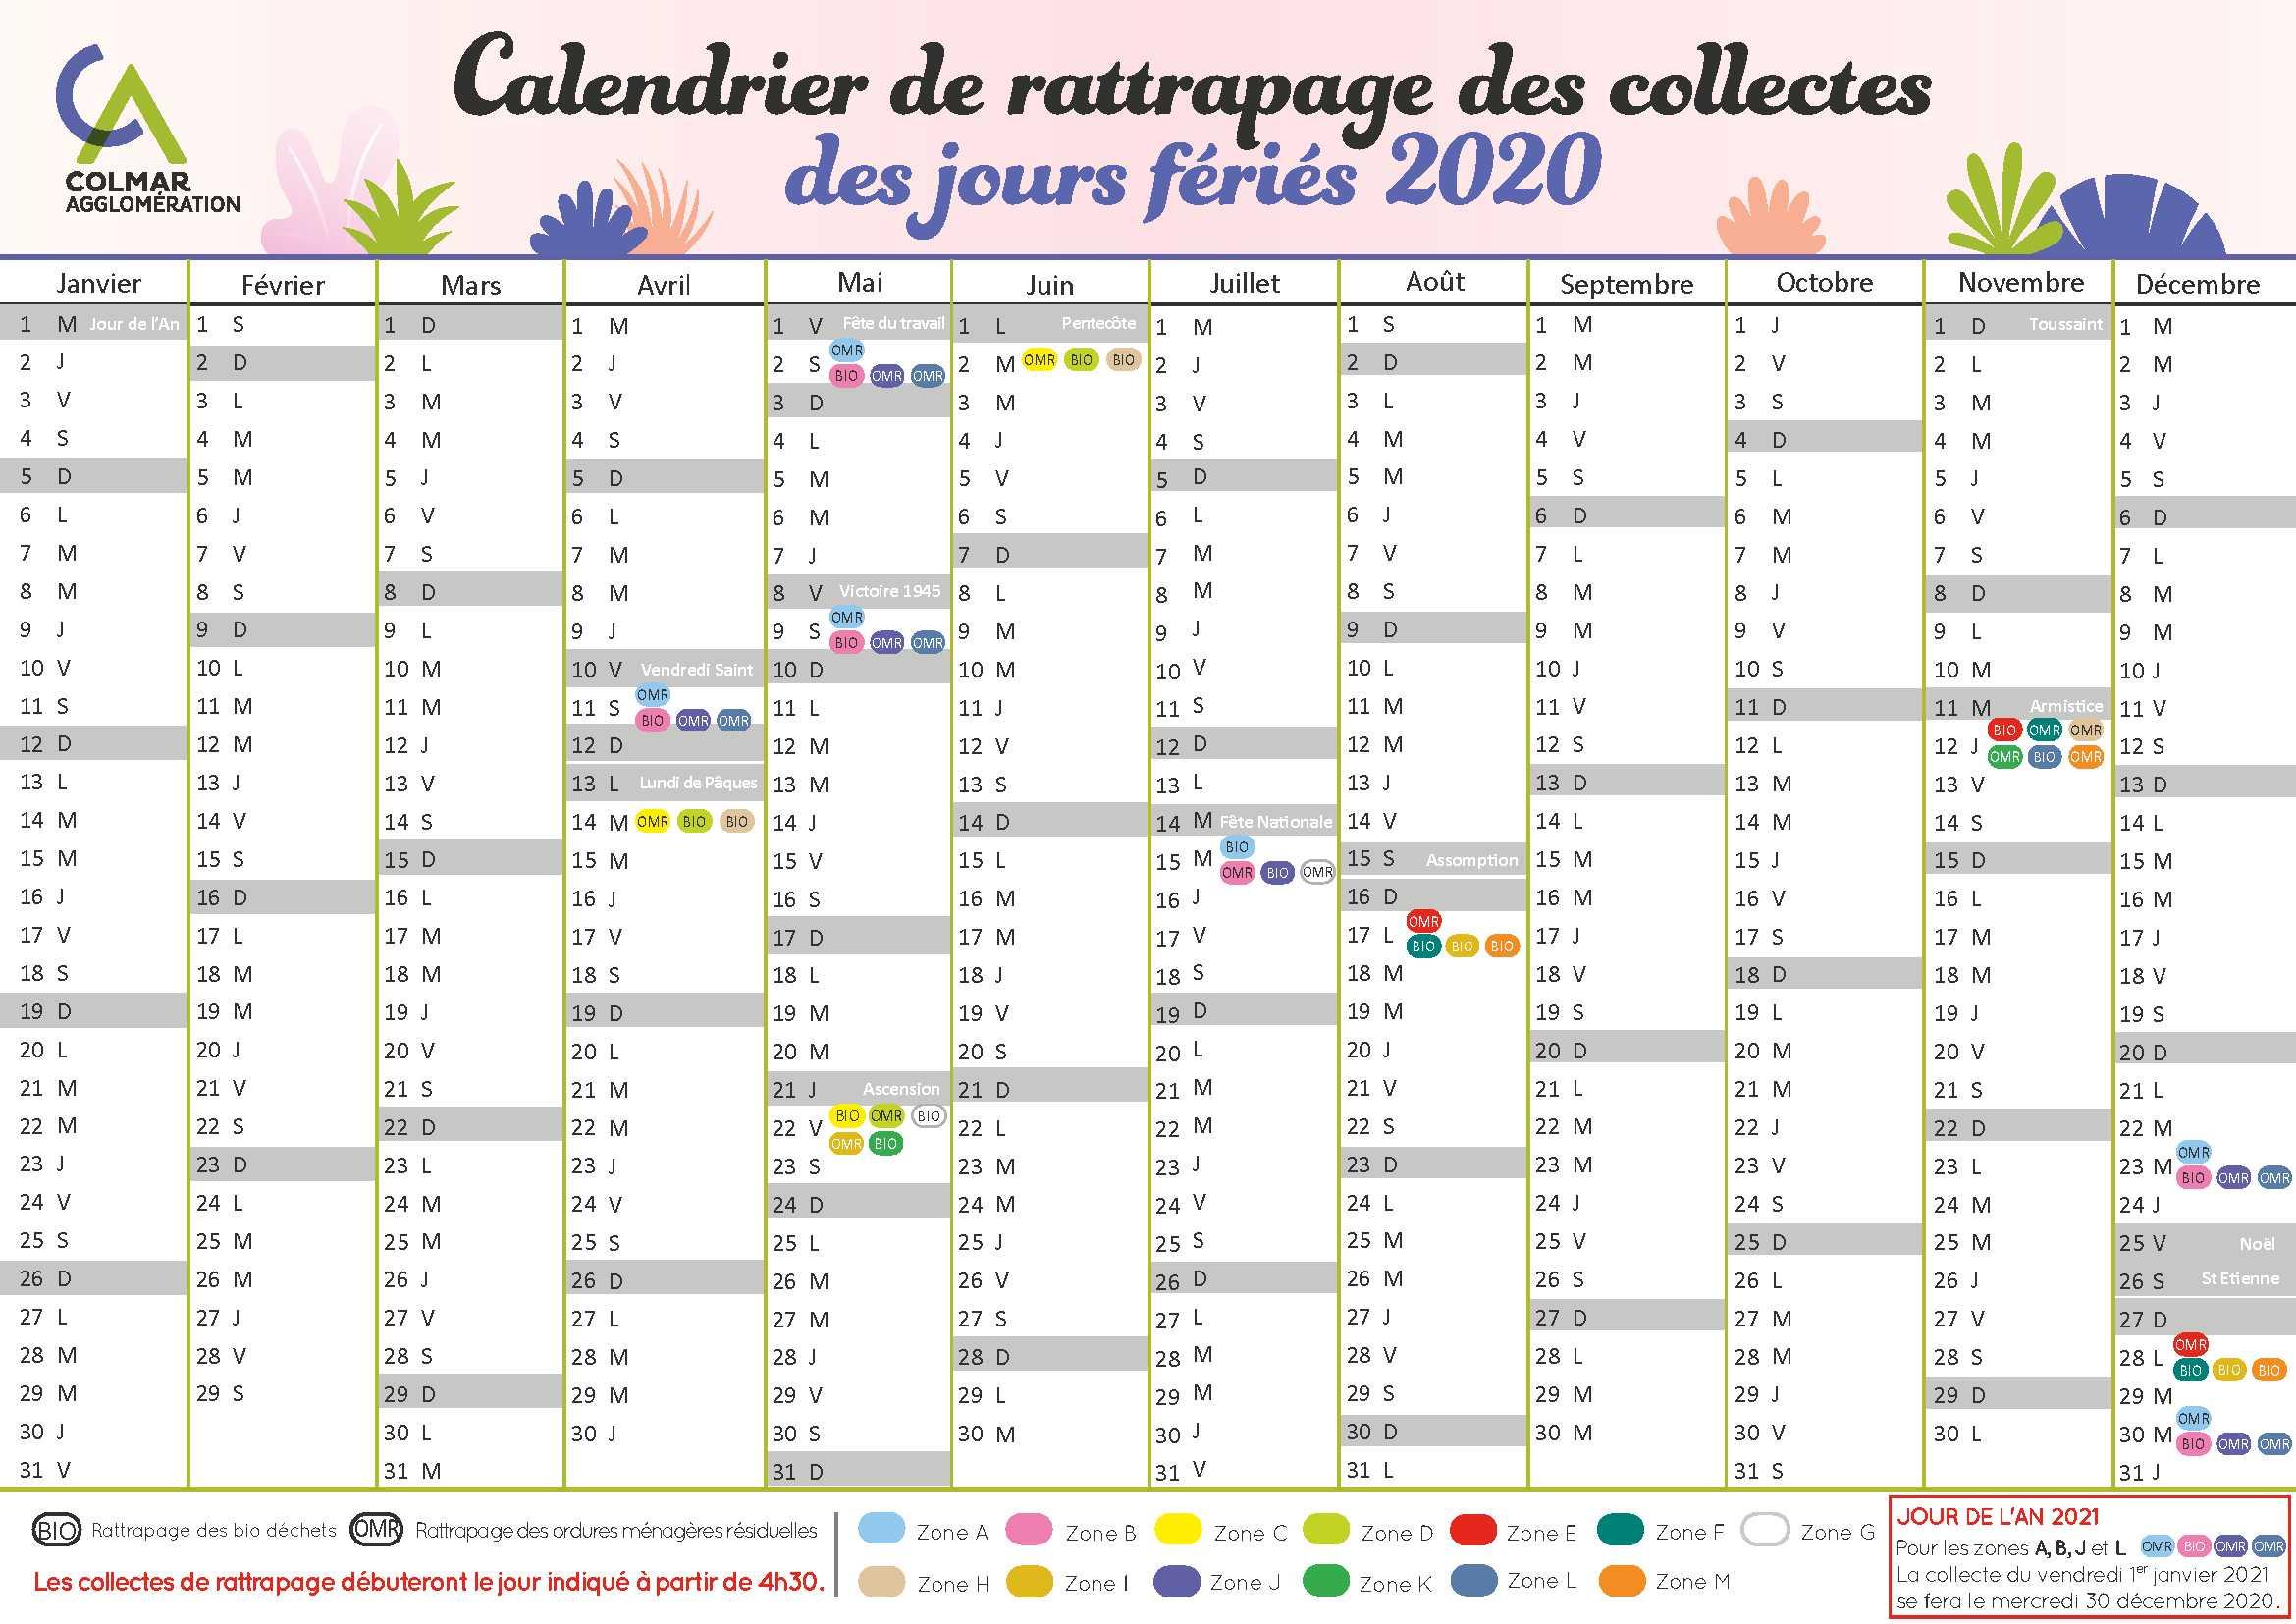 calendrier-tri-2020-communes-ca-maj-fev-2020_3.jpg